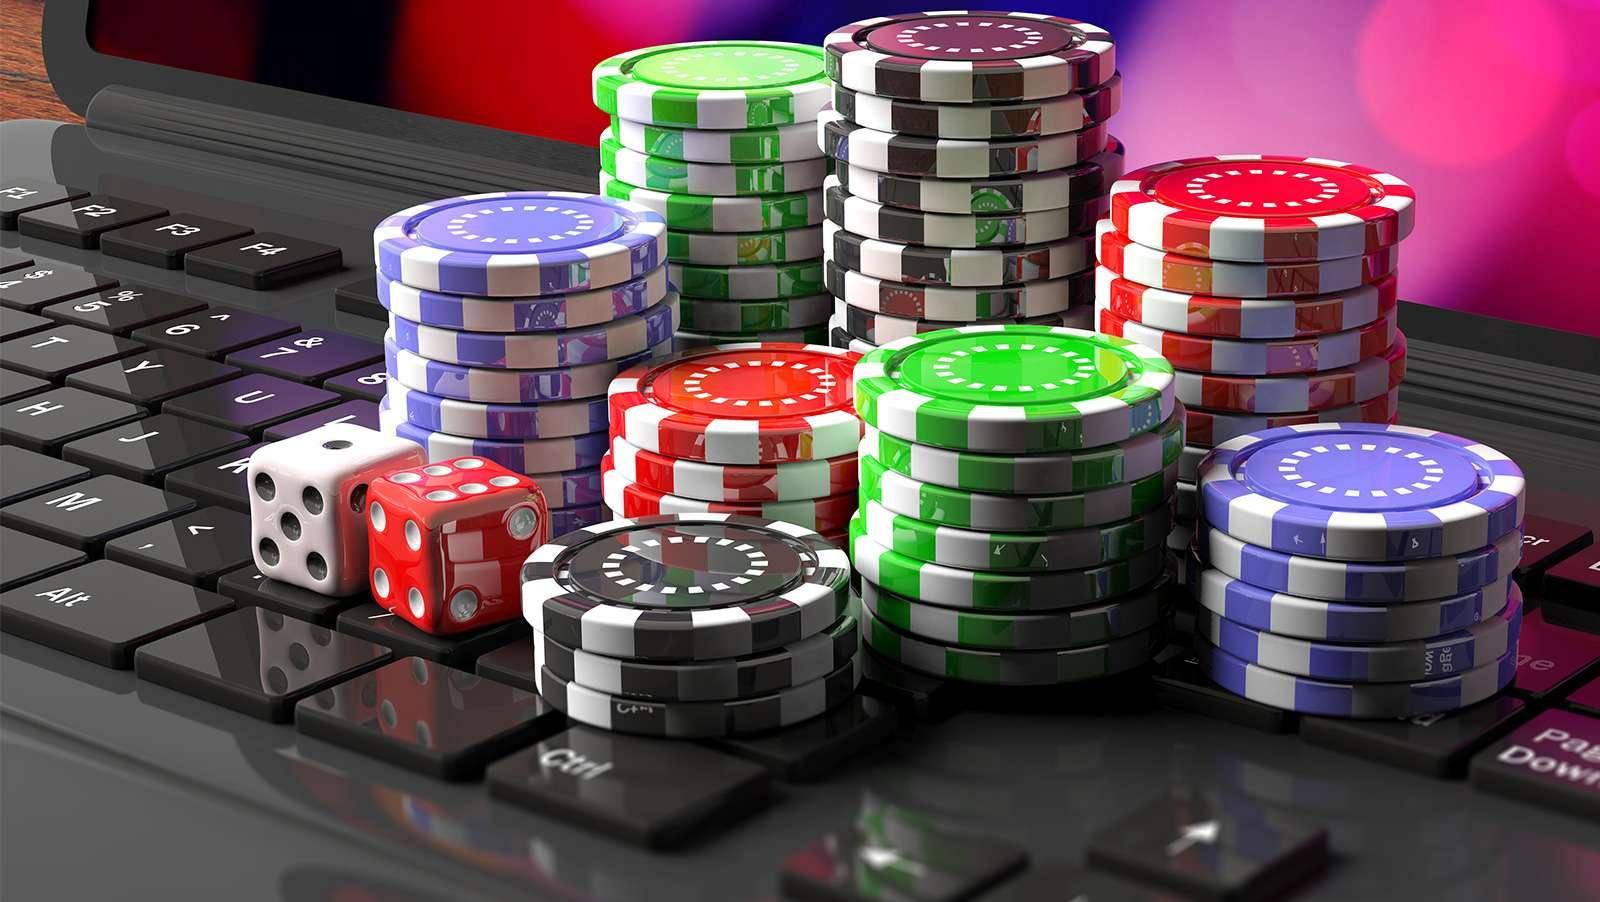 C:\Users\Thiru\Pictures\online-gambling-market.jpg